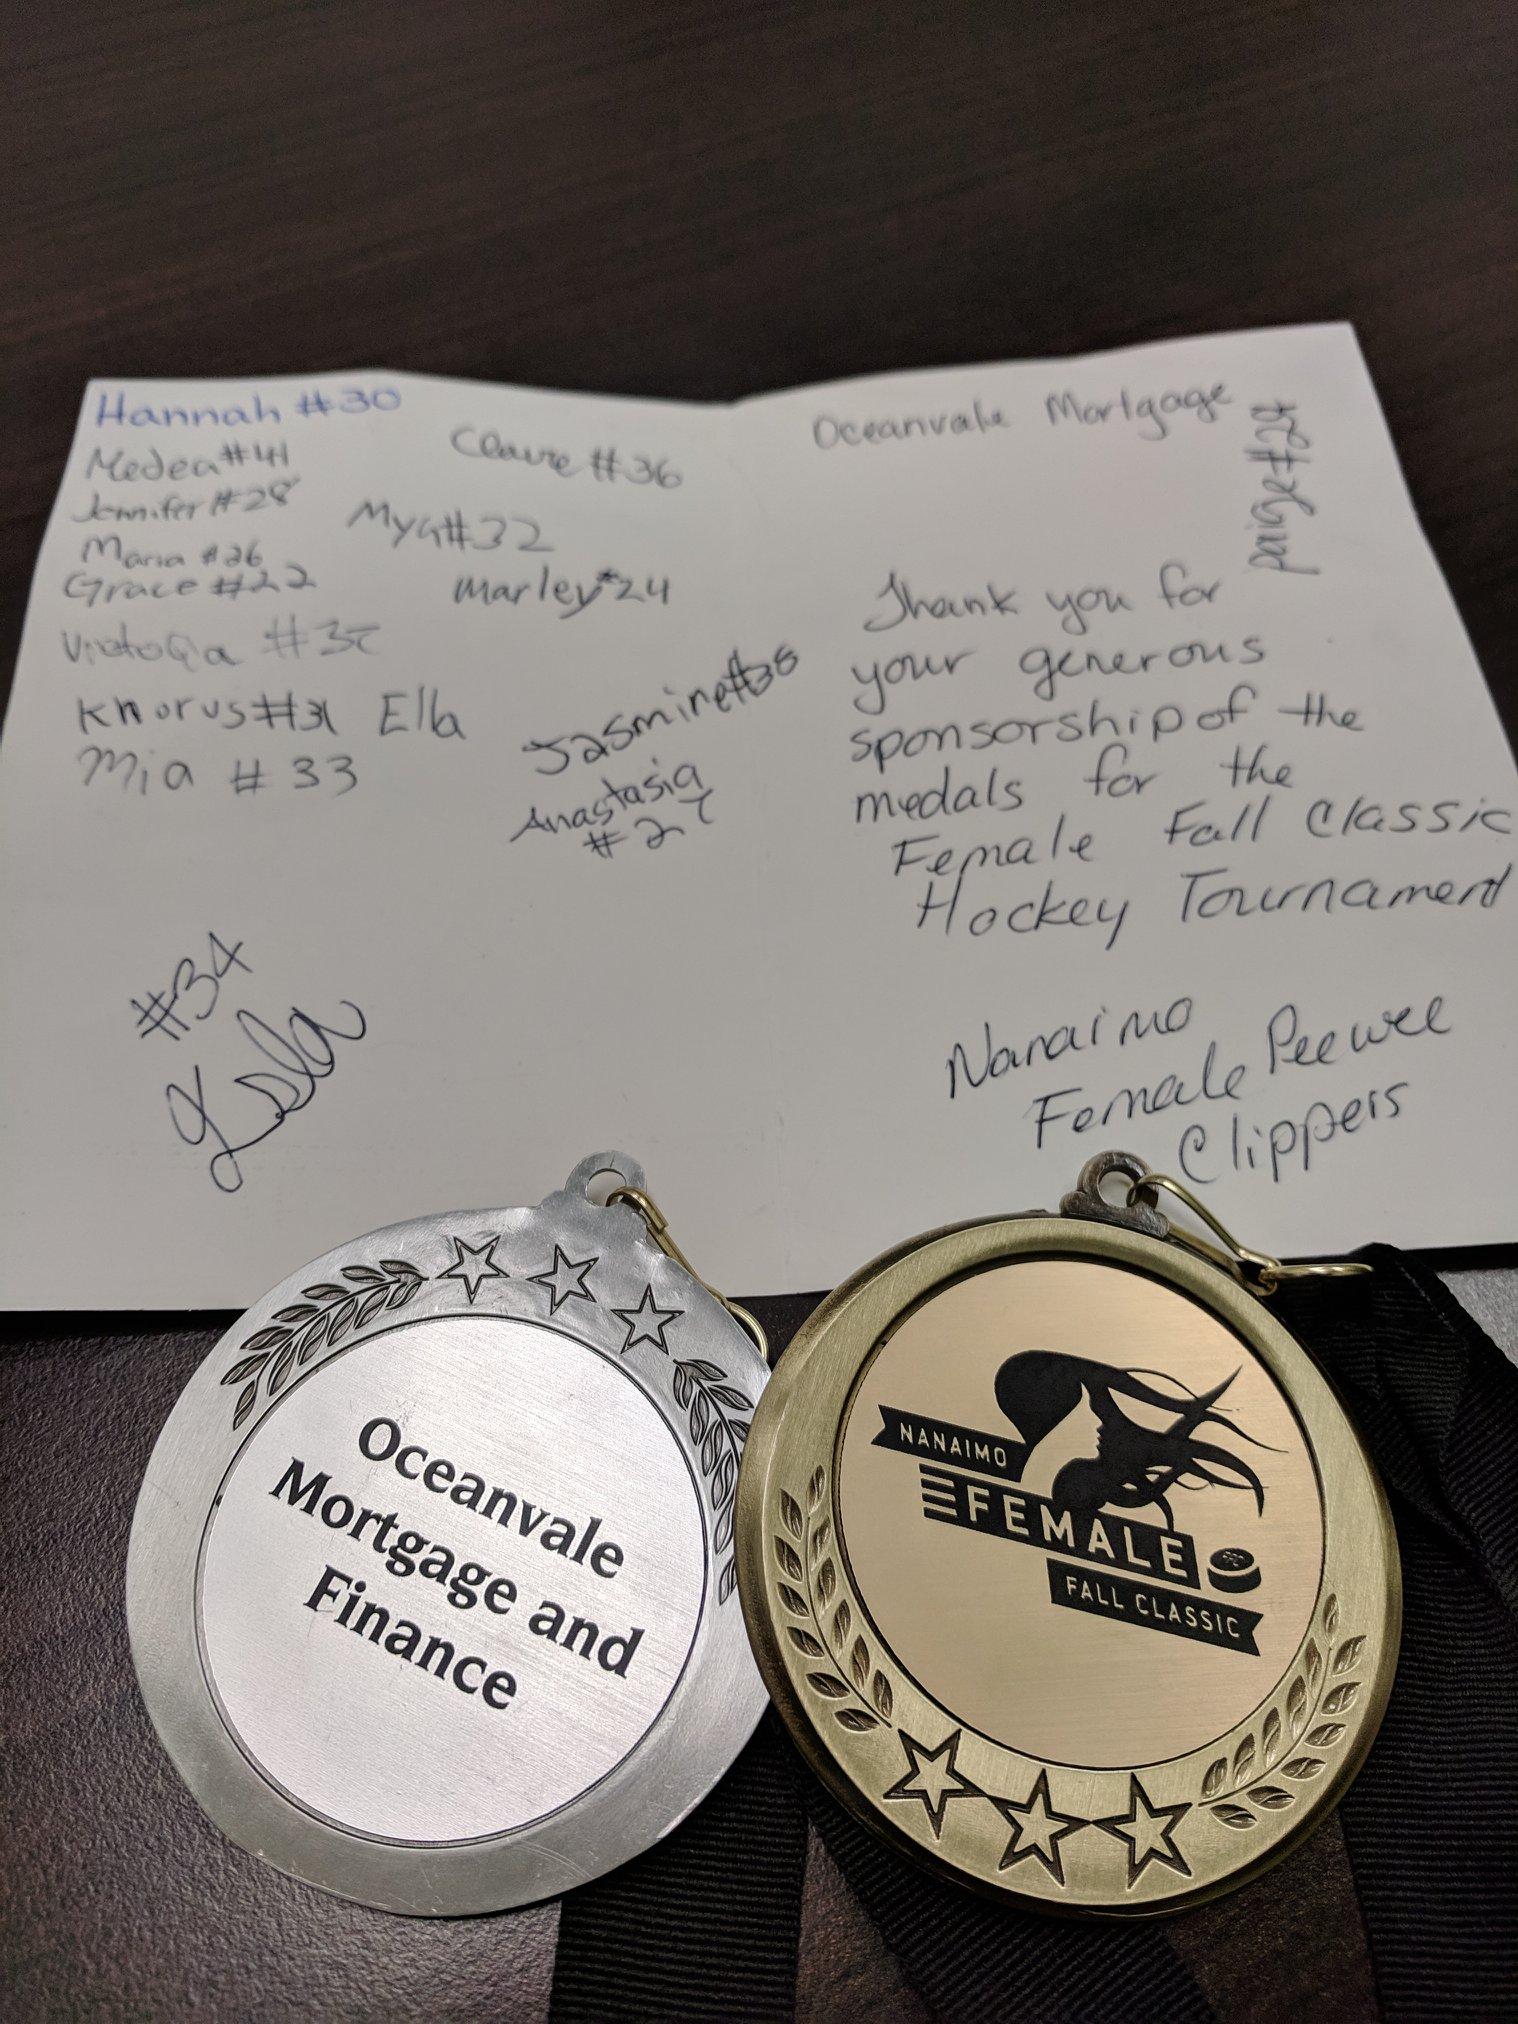 2018 Female Fall classic tournament medals